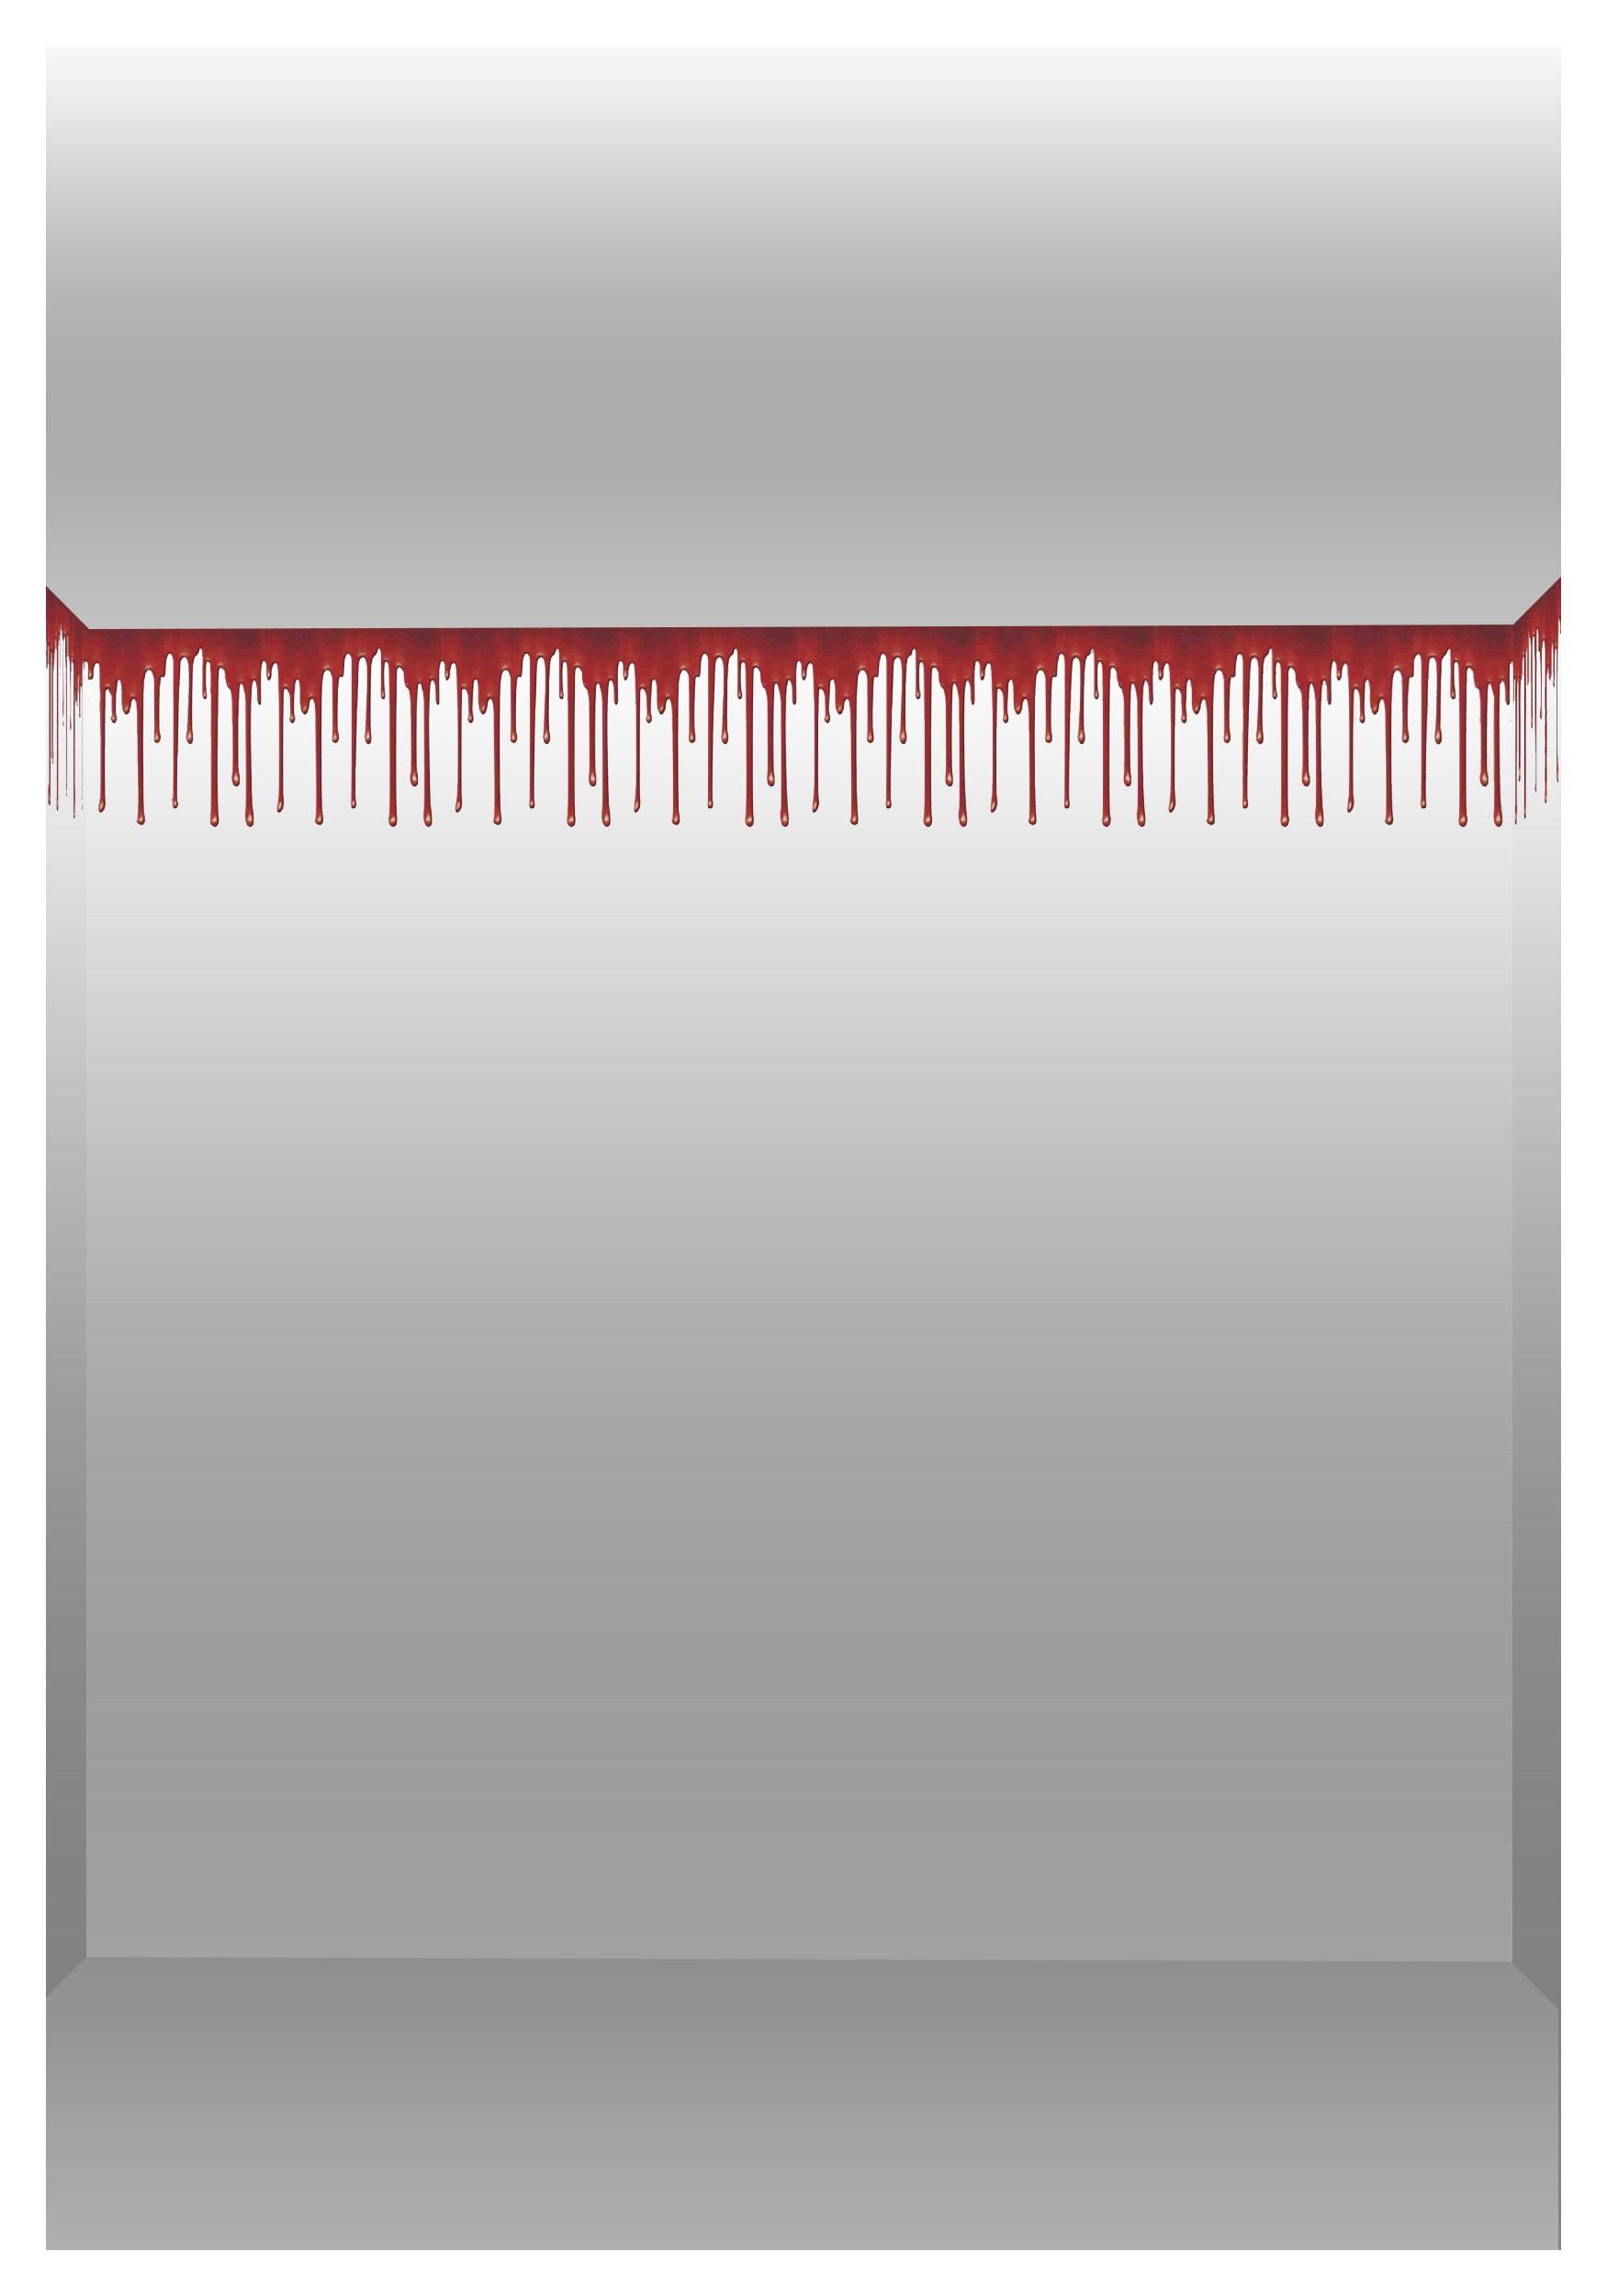 Dripping Blood Border Roll